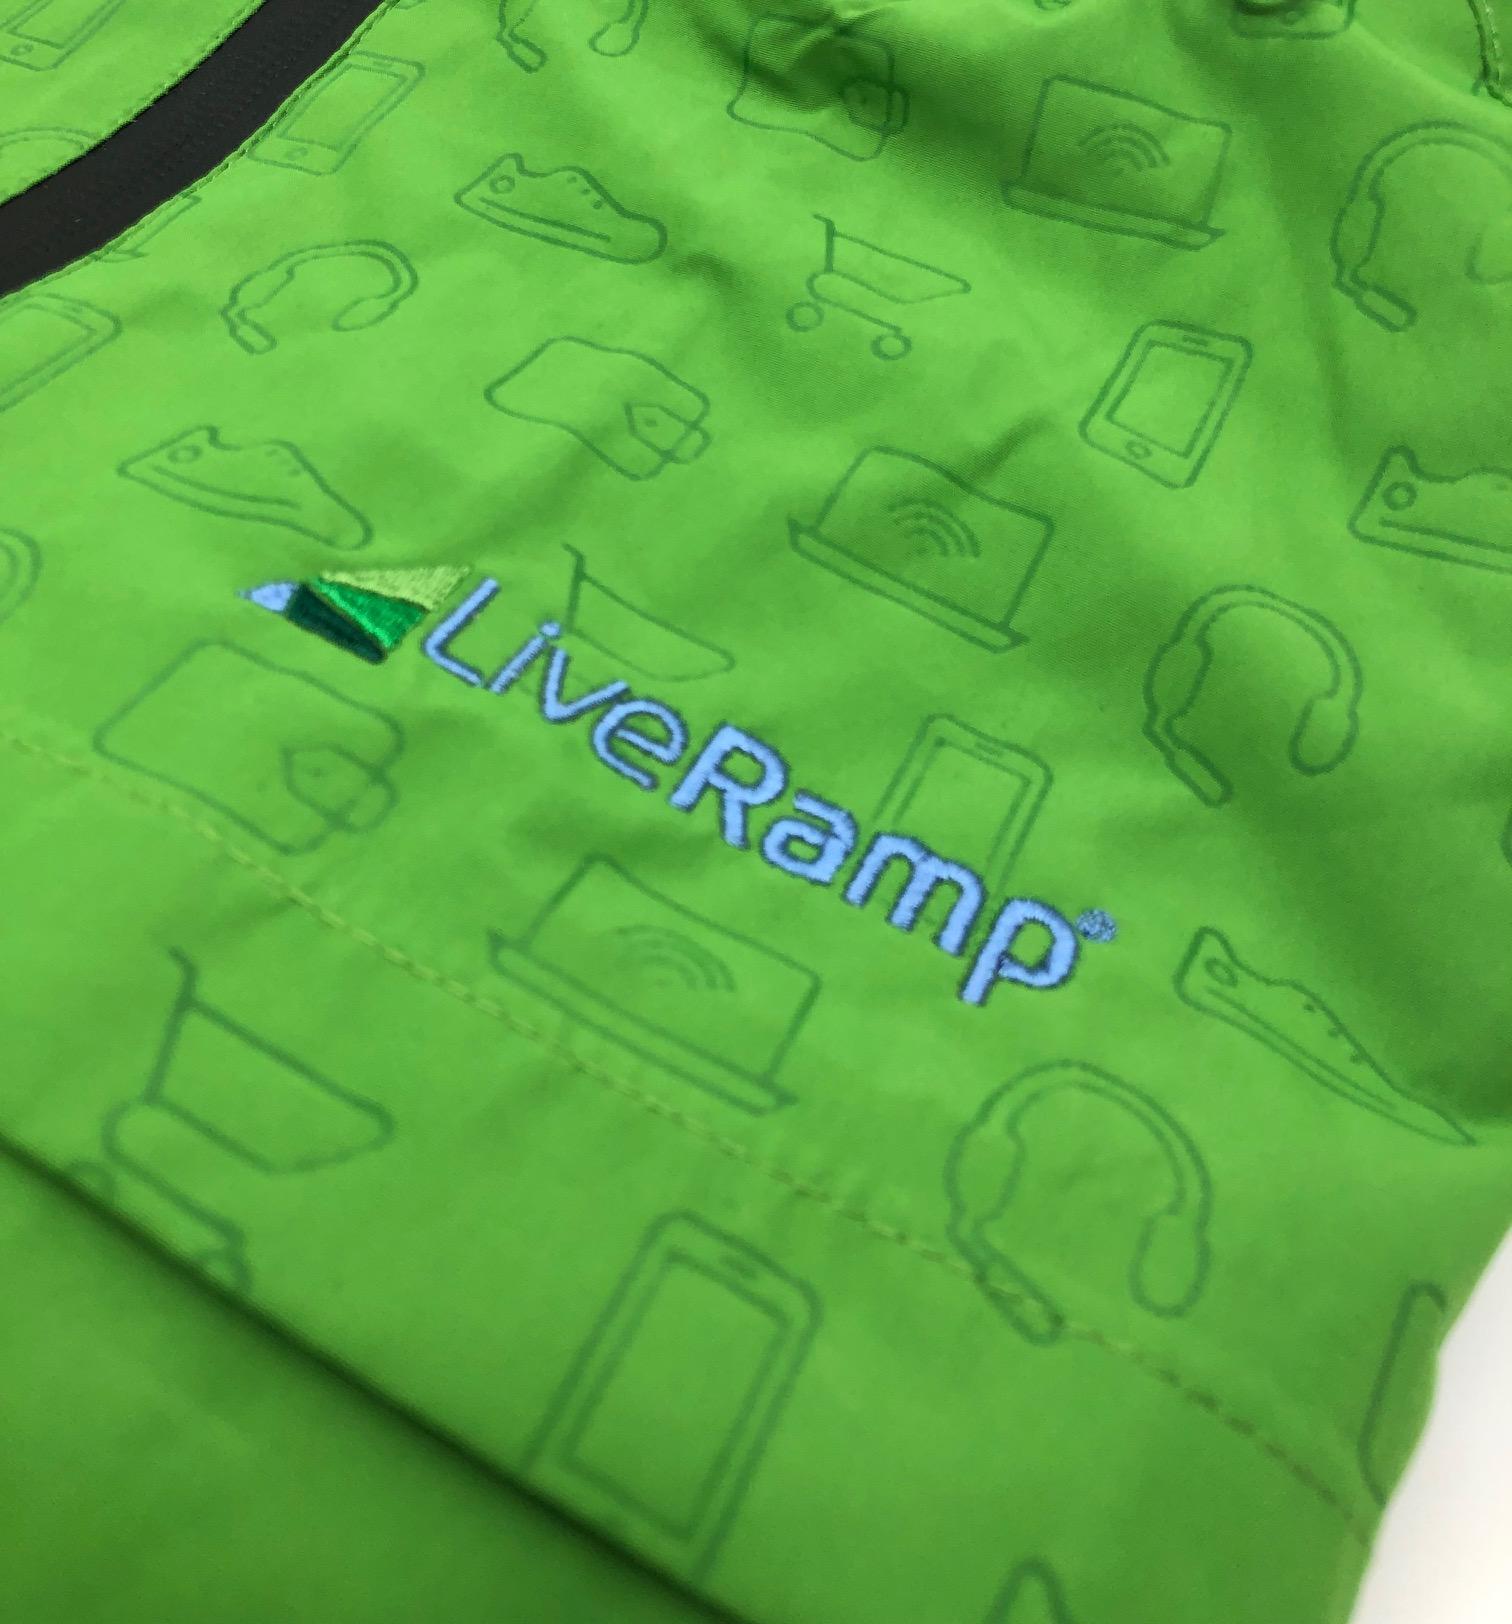 logounltd_laser_etching_embroidery_screen_printing_apparel_uniform_custom_tshirts_t_shirt_kirkland_bellevue_seattle_redmond_woodinville_branded_merchandise_promotional_products_logo_unltd_live_ramp (8).jpg